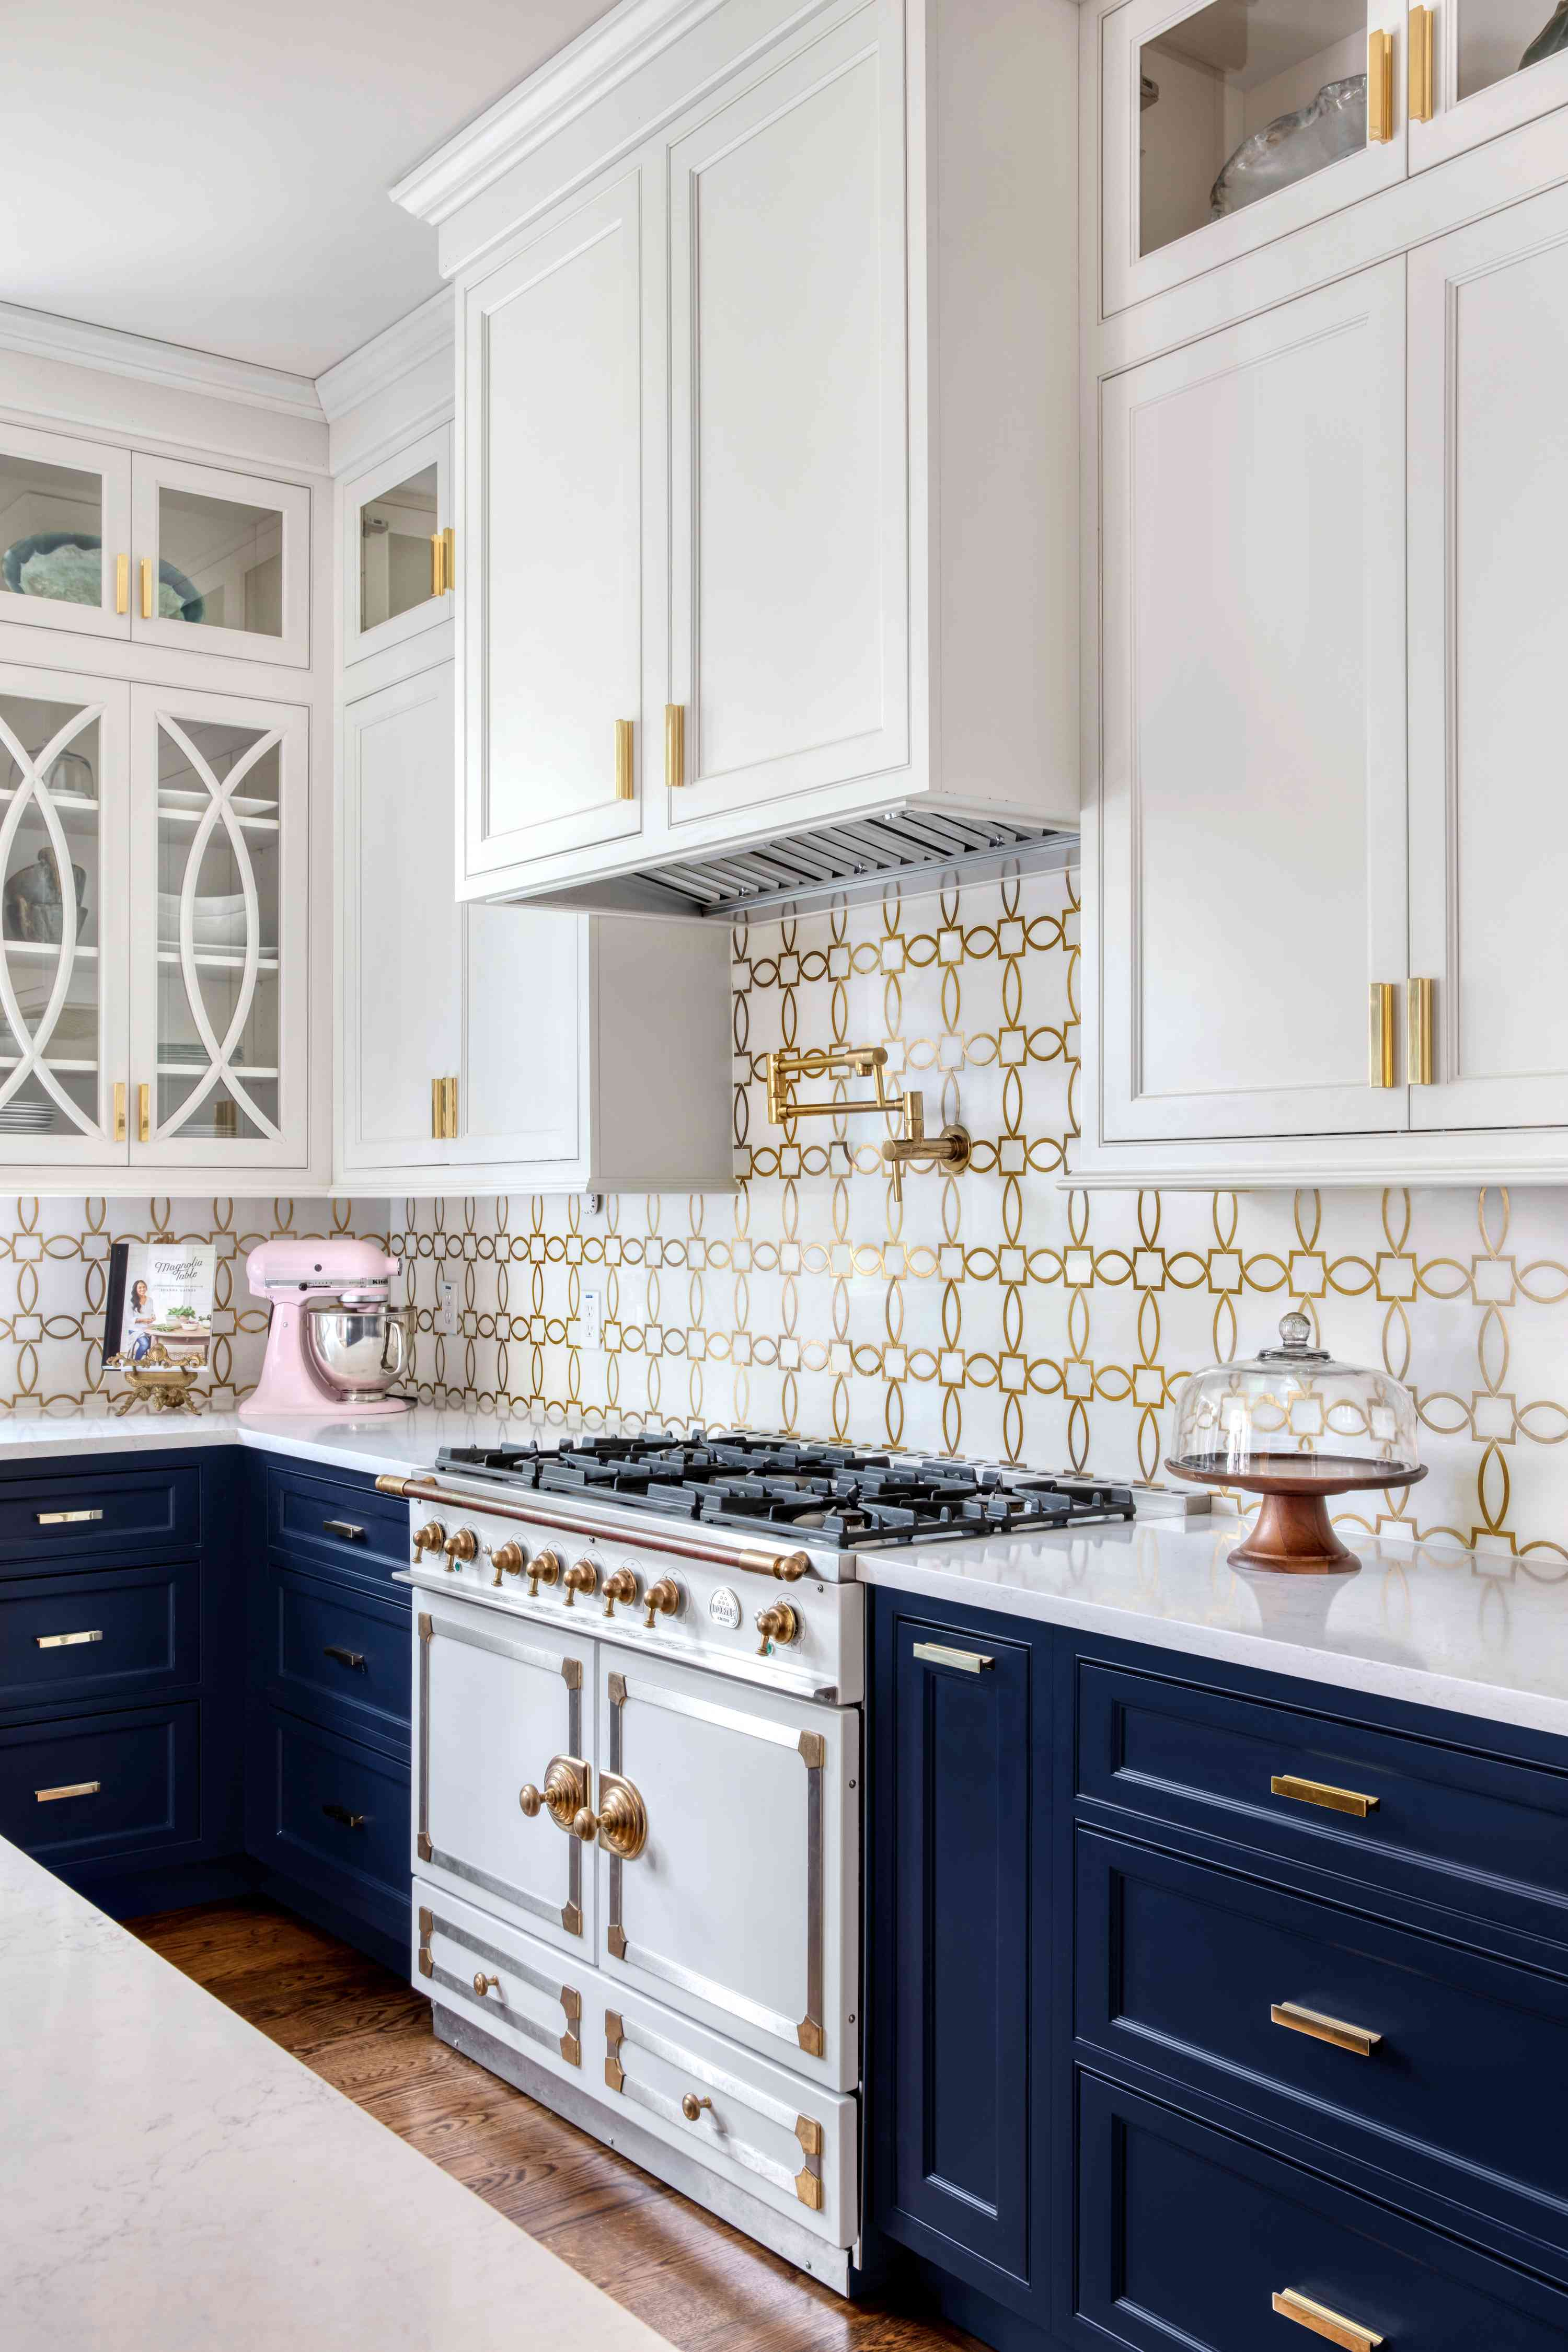 Gold and white backsplash in navy and white kitchen